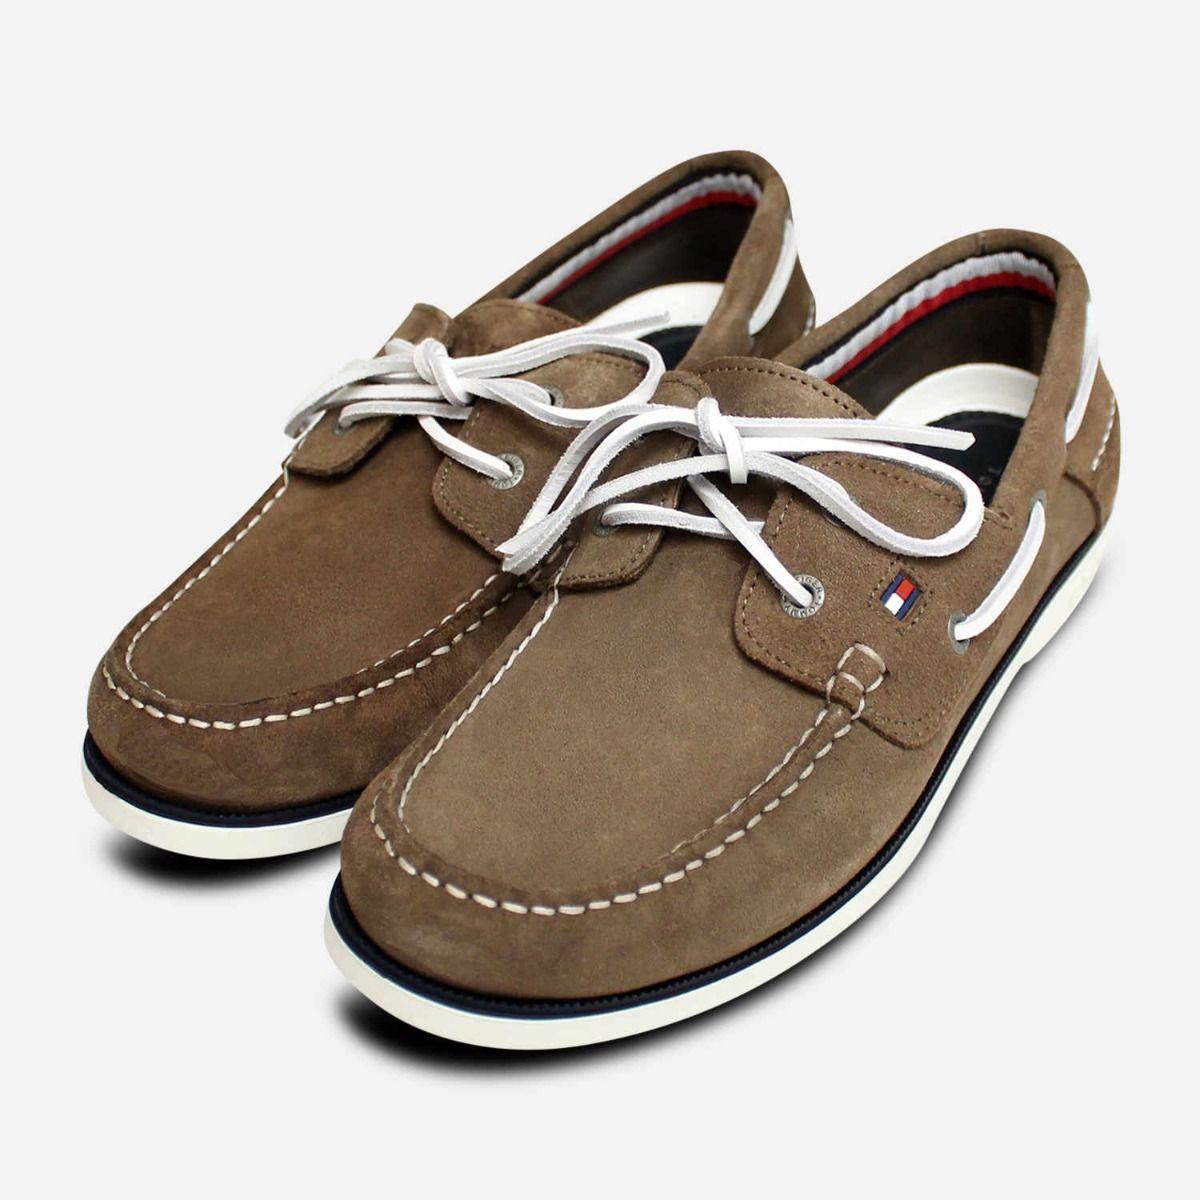 Tommy Hilfiger Mens Boat Shoes in Olive